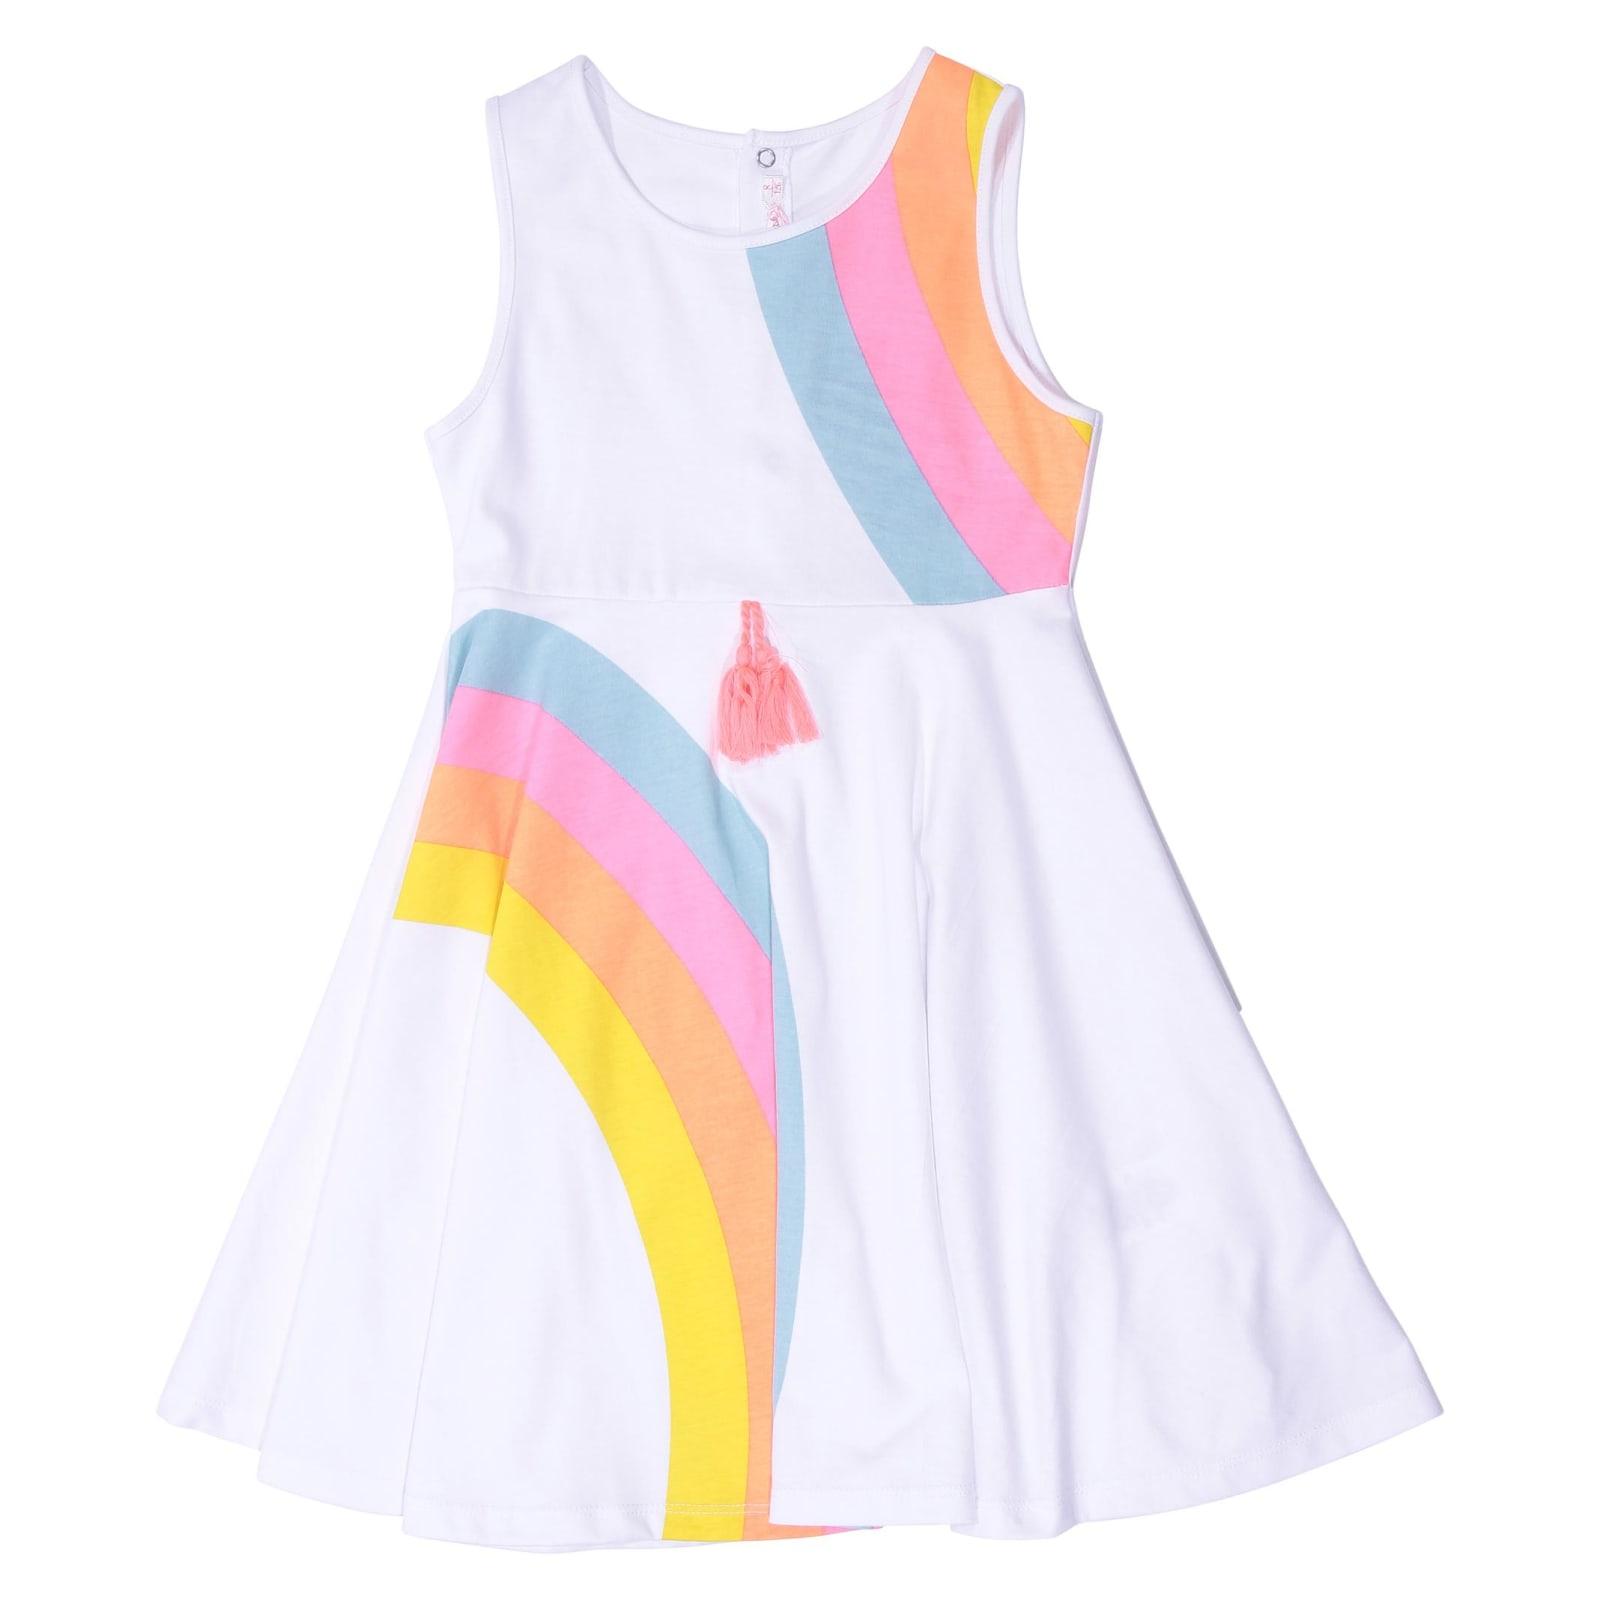 Billieblush White Cotton Jersey Dress